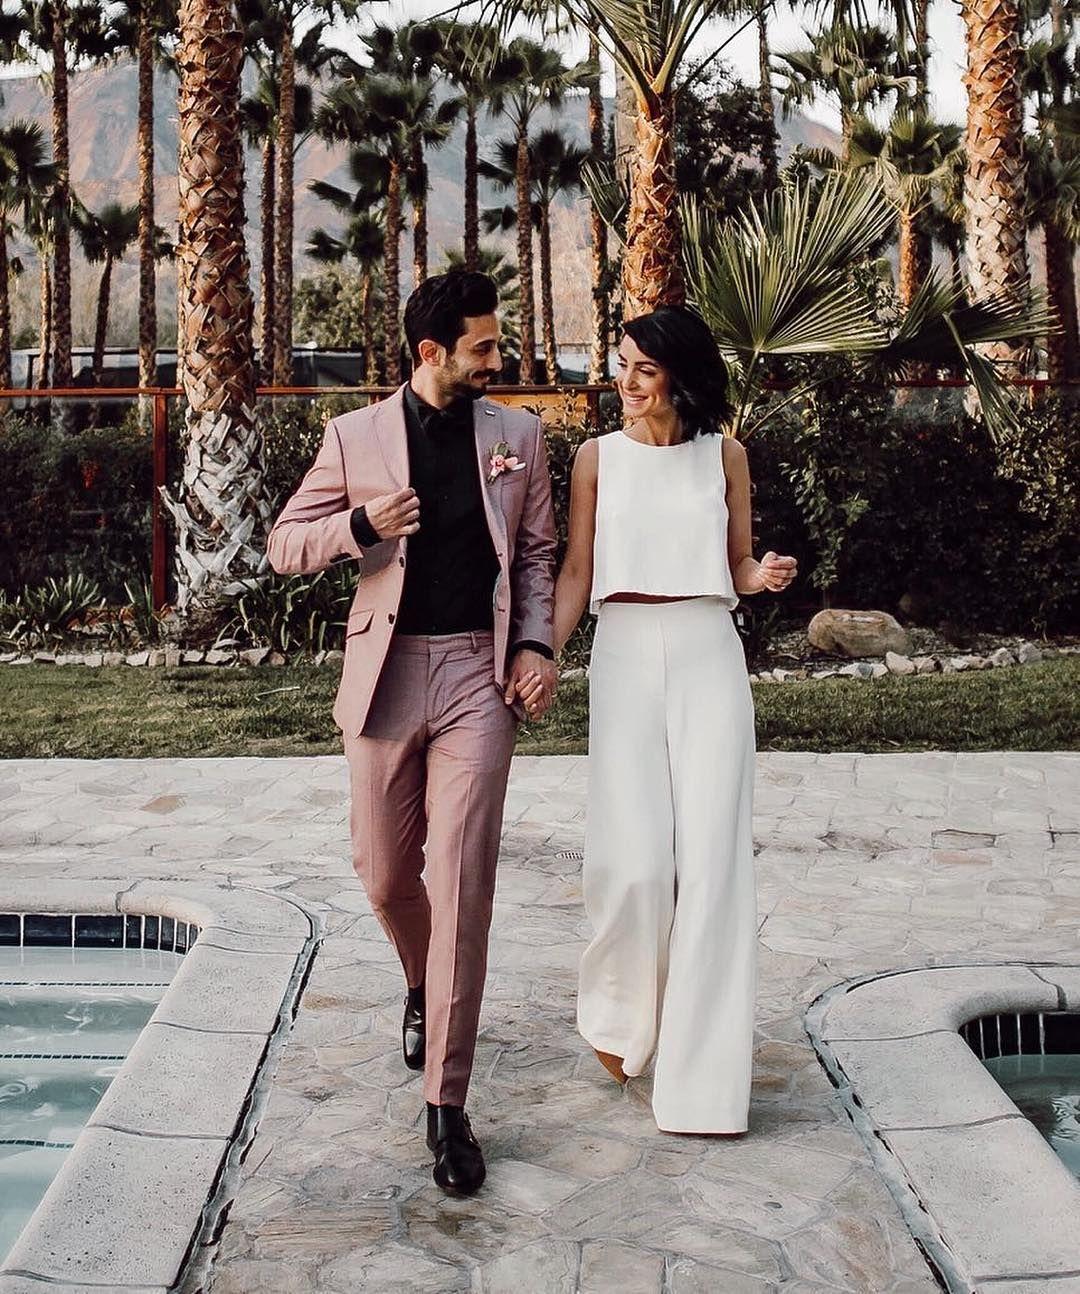 "Lovely Bride on Instagram: ""Comin' in hot with @alexandragrecco's 'Harlow Set.' How chic is @sarah_najafi?! ⠀⠀⠀⠀⠀⠀⠀⠀⠀ ___⠀⠀⠀⠀⠀⠀⠀⠀⠀ store: @lovelybridela photographer:…"" #pinterestwedding"